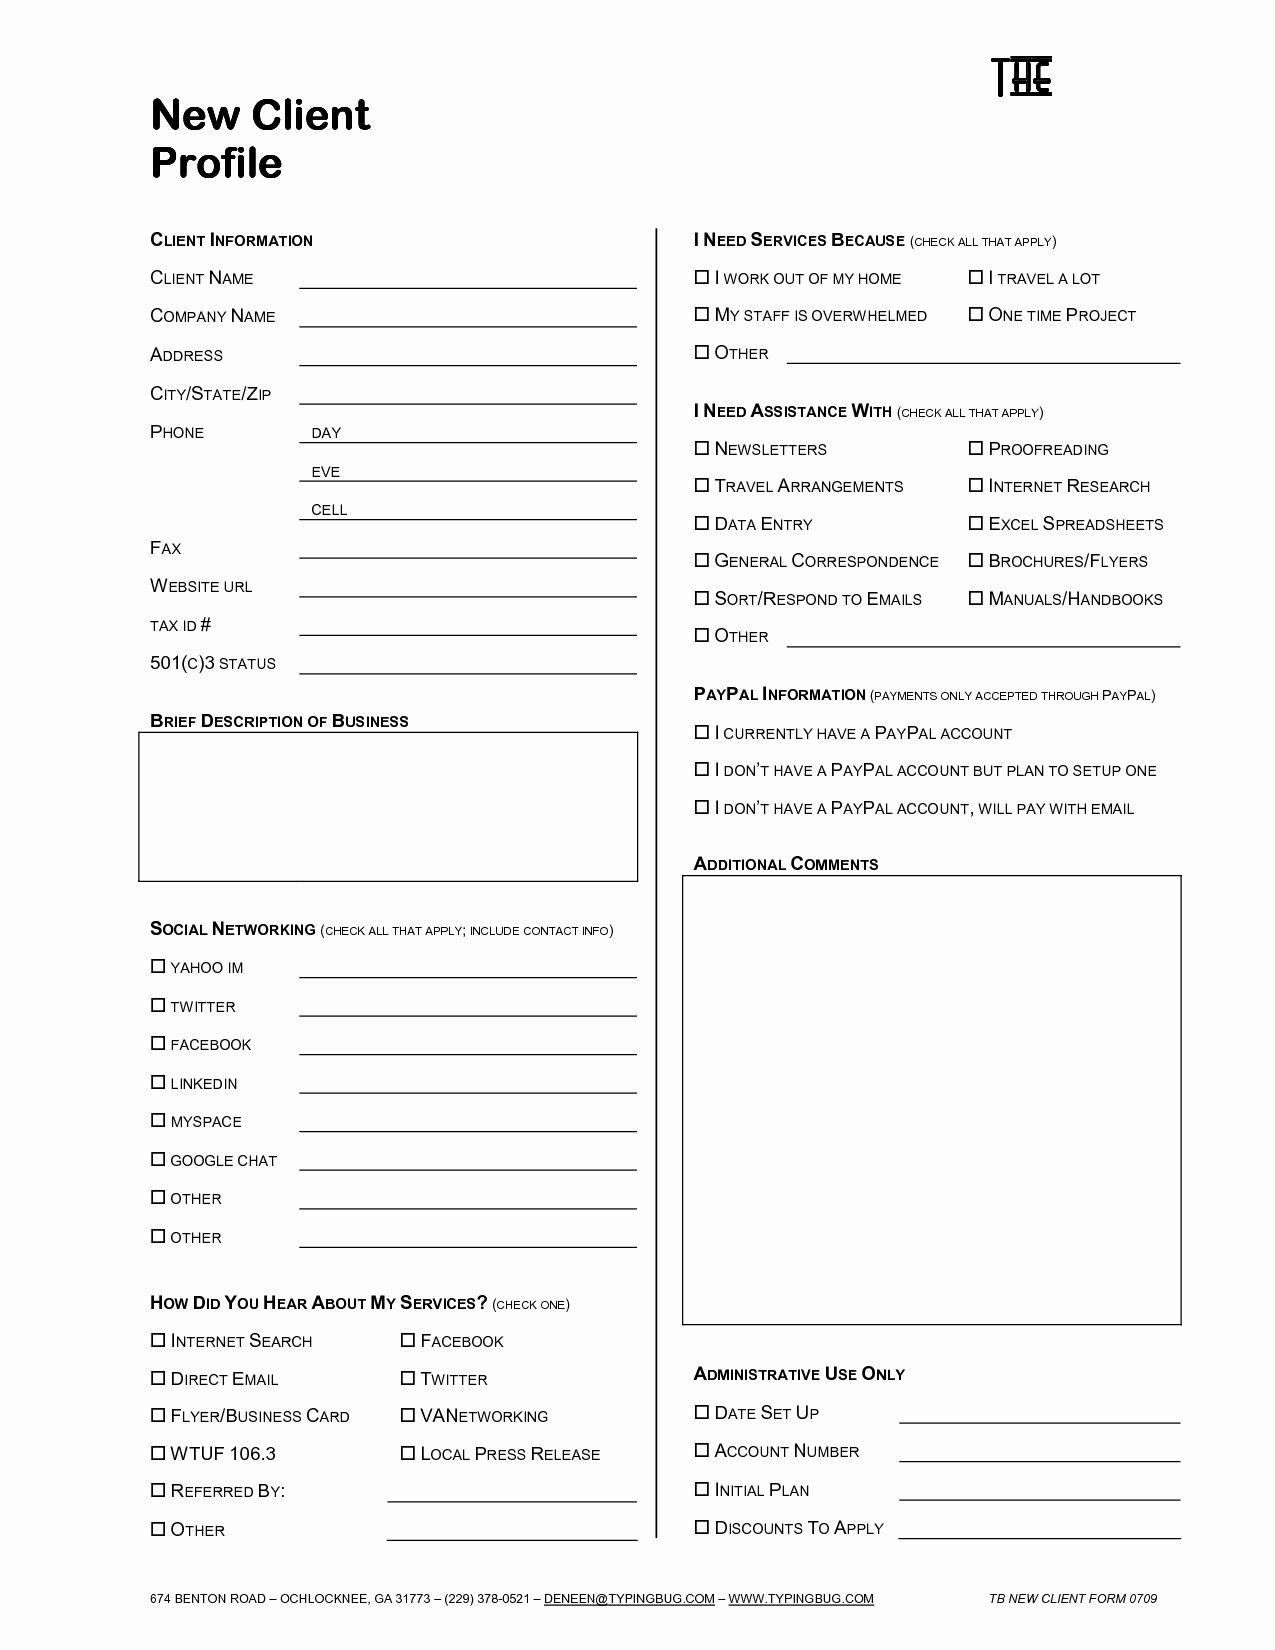 Customer Profile Form Luxury Interior Design Client